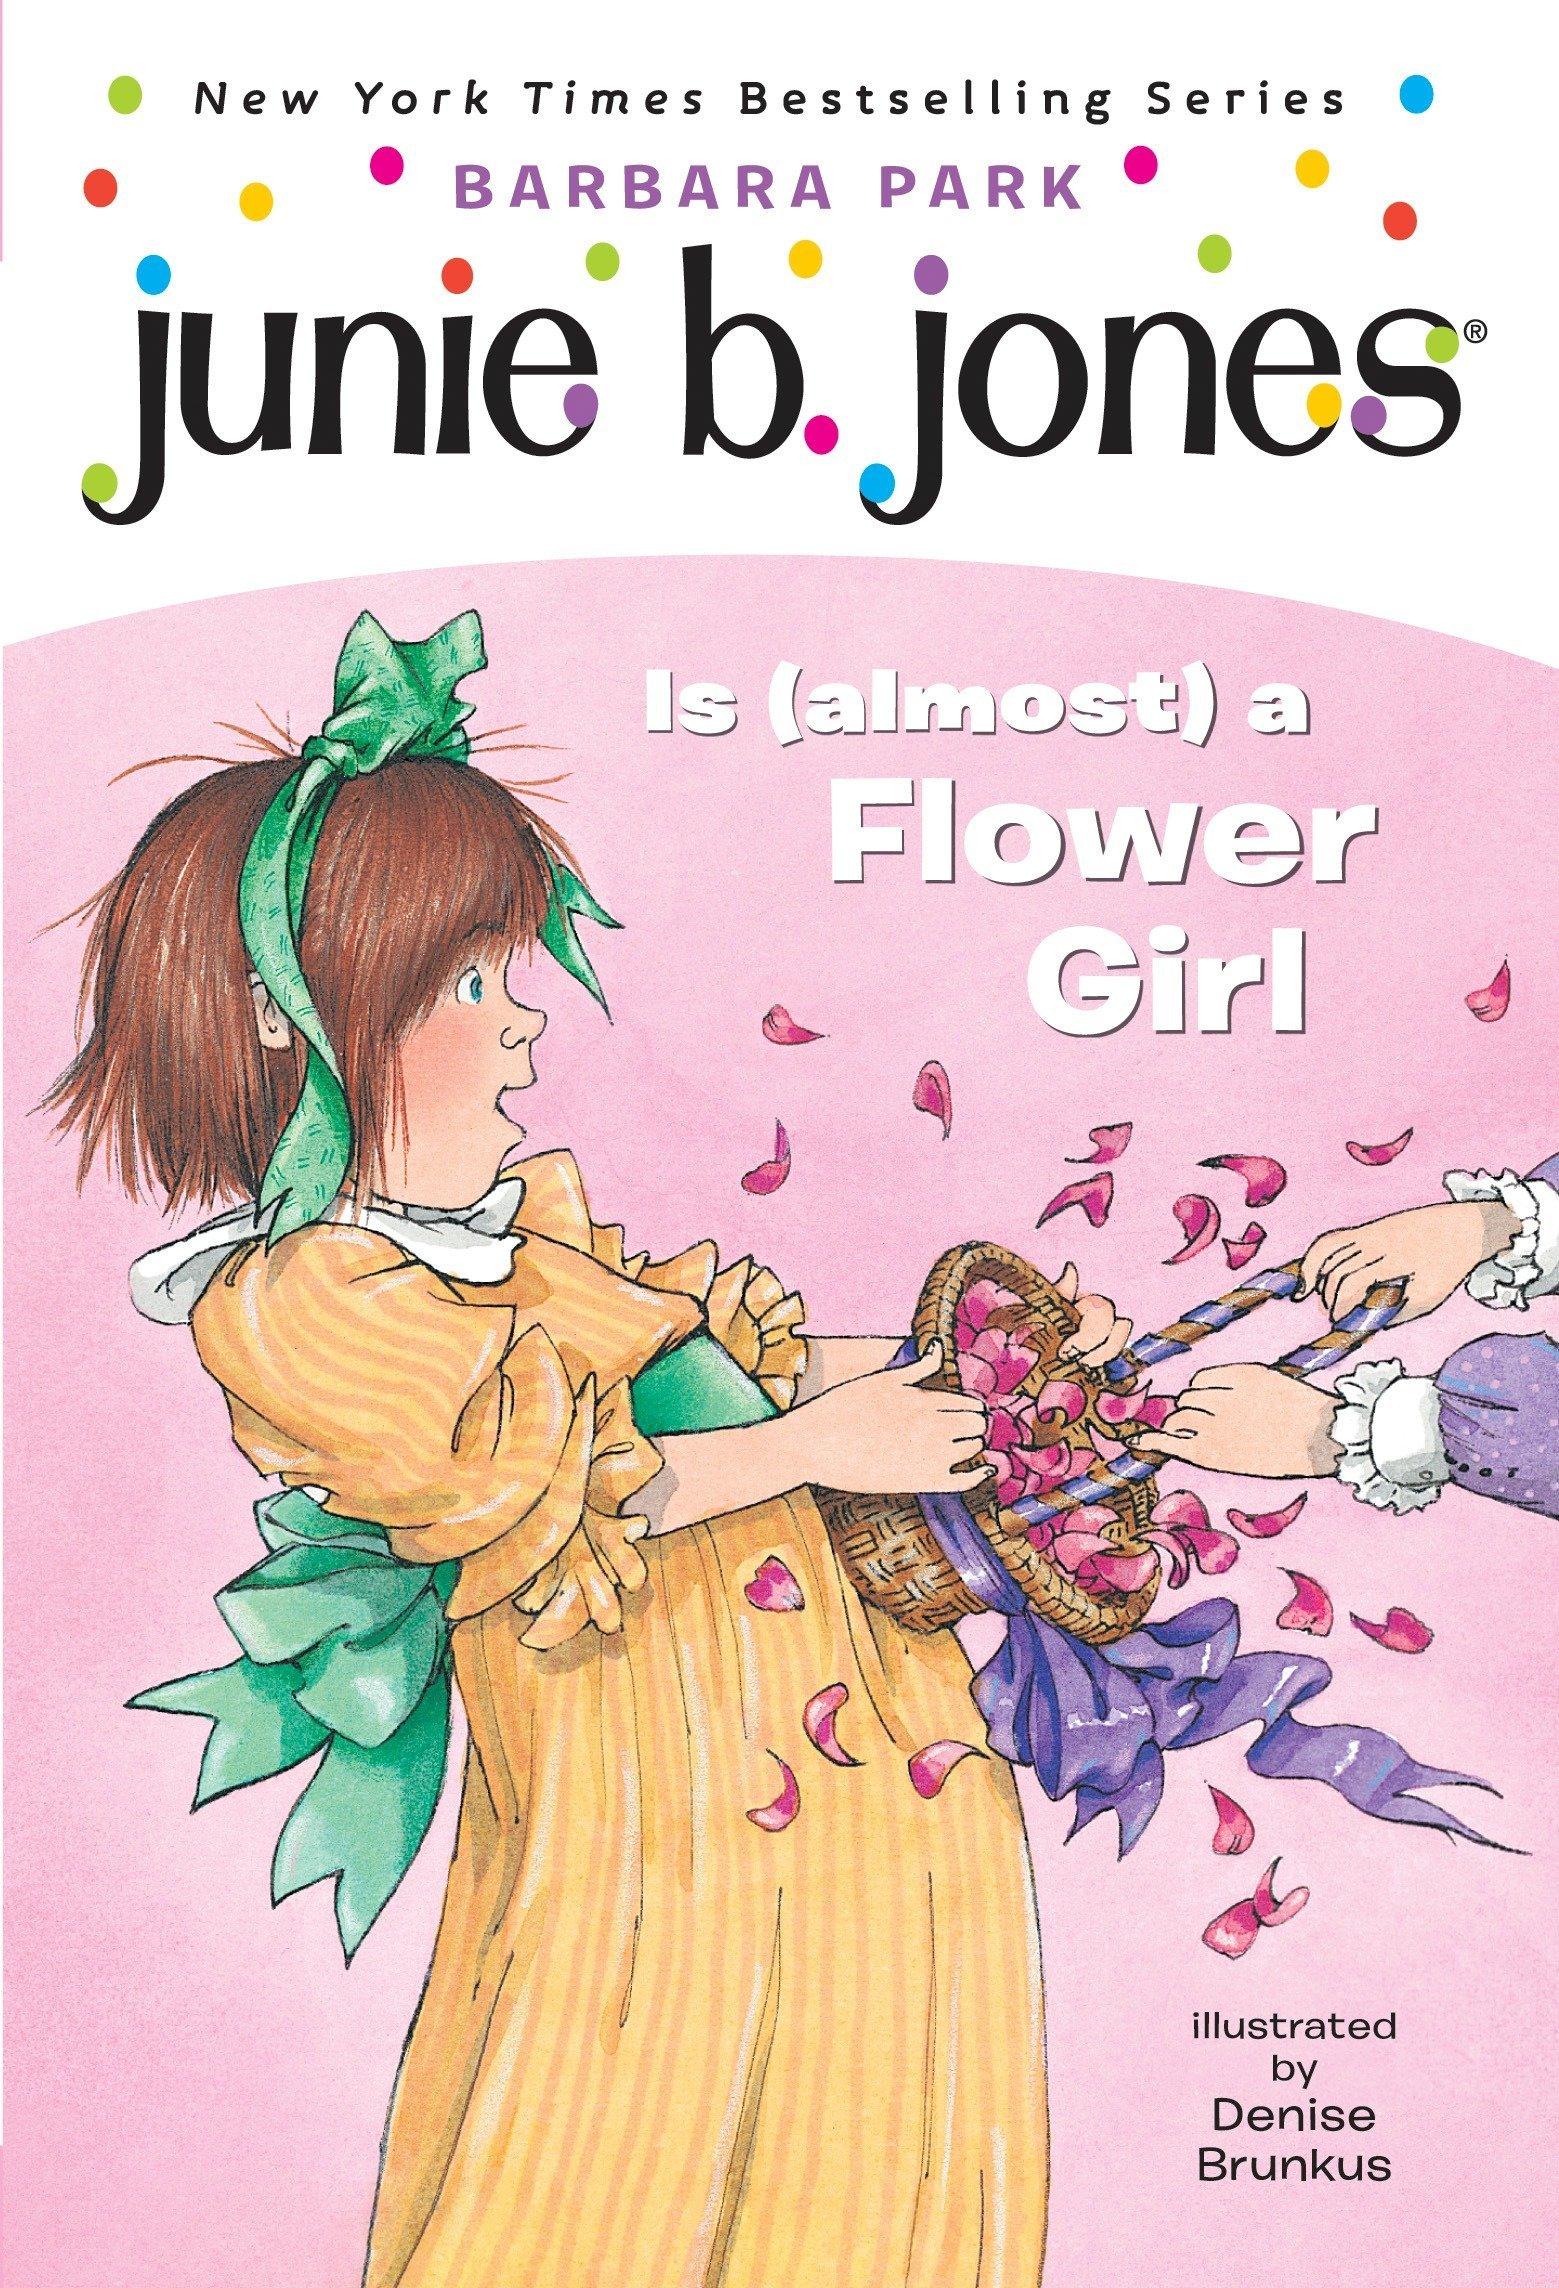 Amazon.com: Junie B. Jones Is (almost) a Flower Girl (Junie B. Jones, No.  13) (9780375800382): Barbara Park, Denise Brunkus: Books